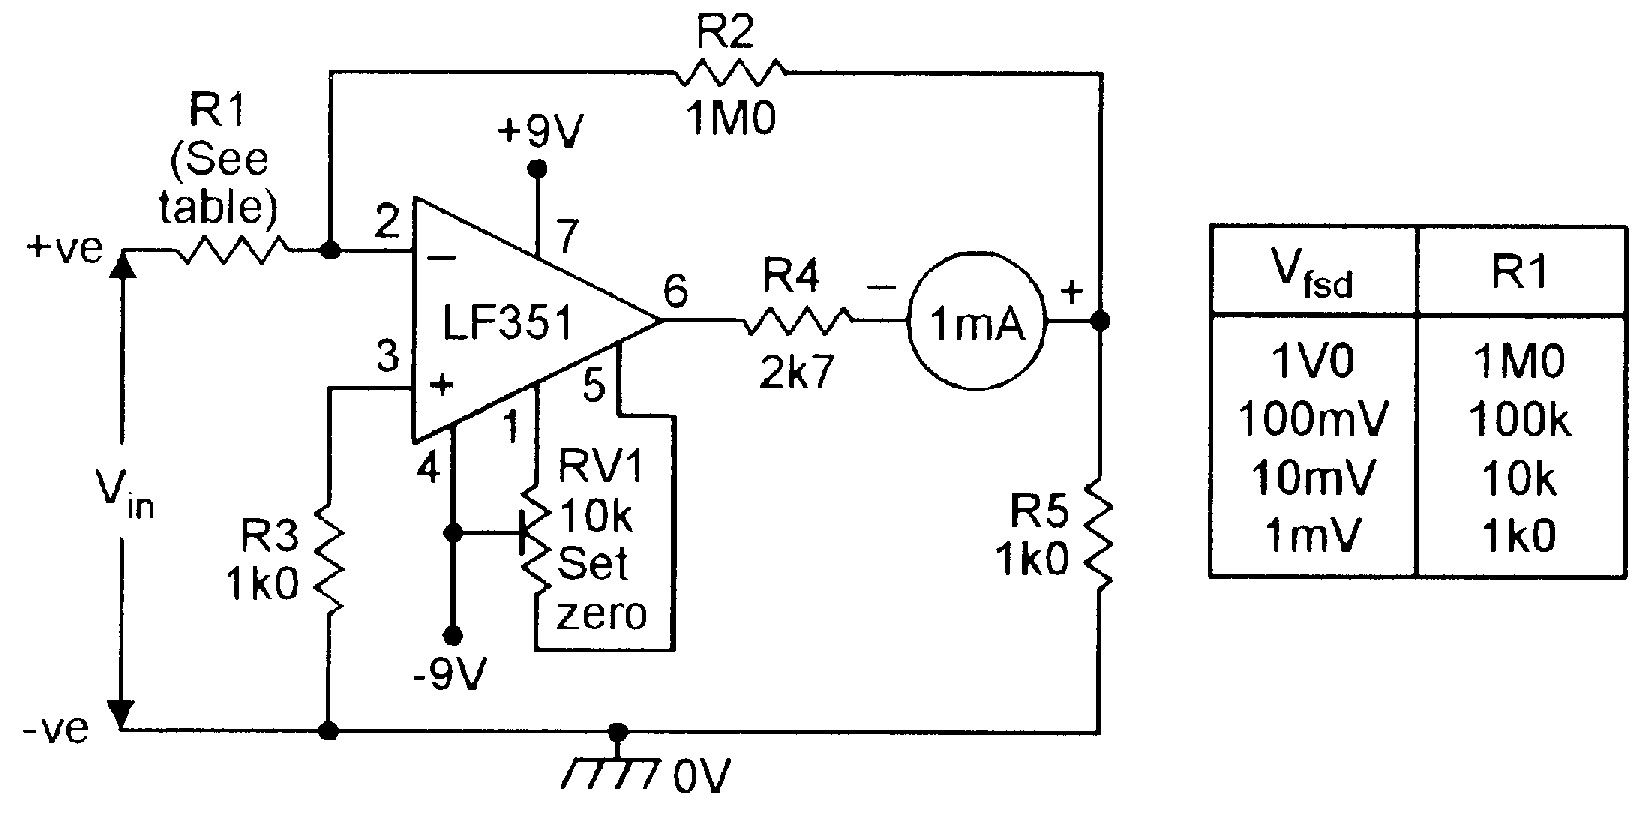 medium resolution of a dc millivoltmeter circuit electronic schematics circuit diagram electronics projects circuits